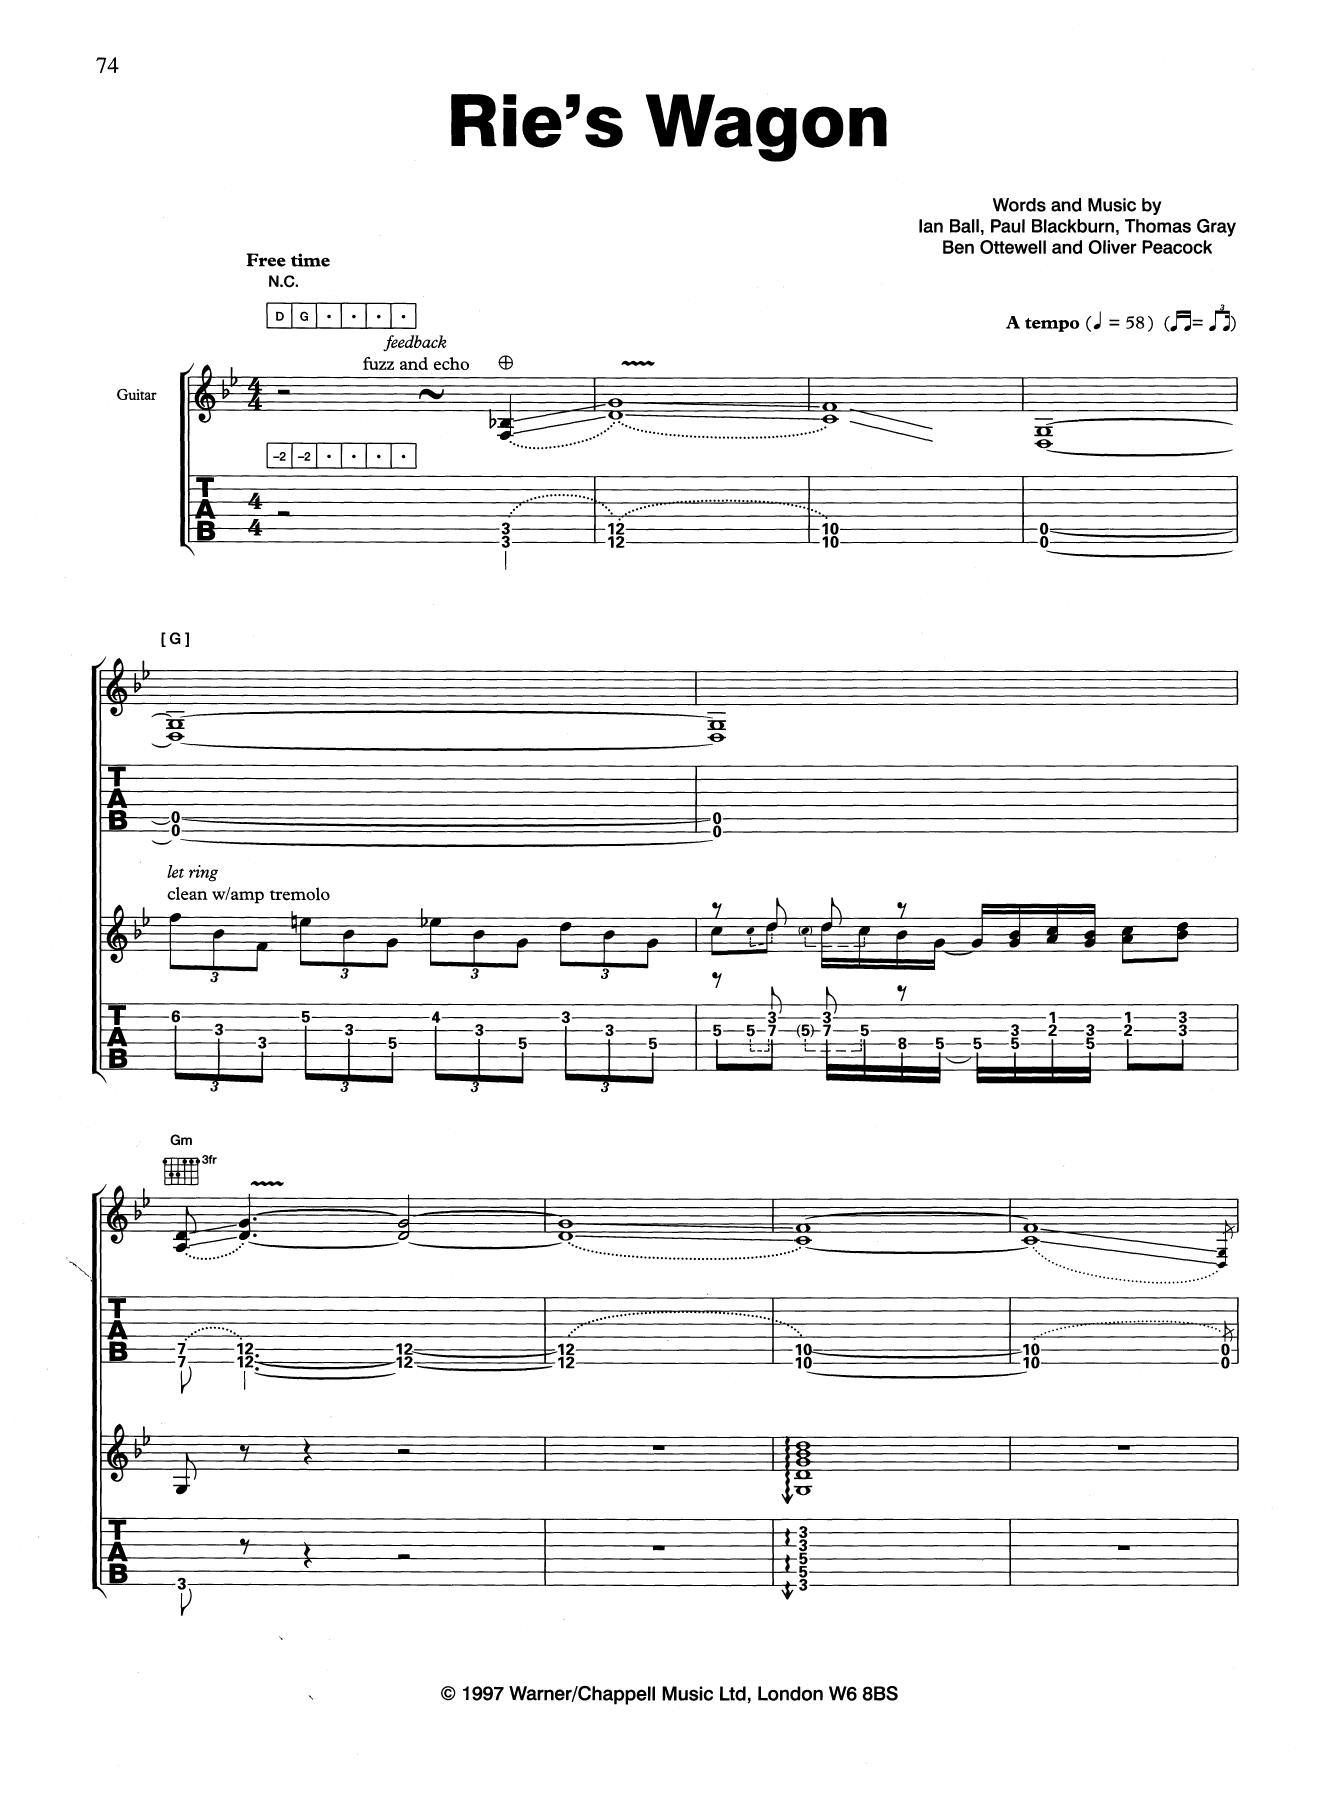 Rie's Wagon Sheet Music